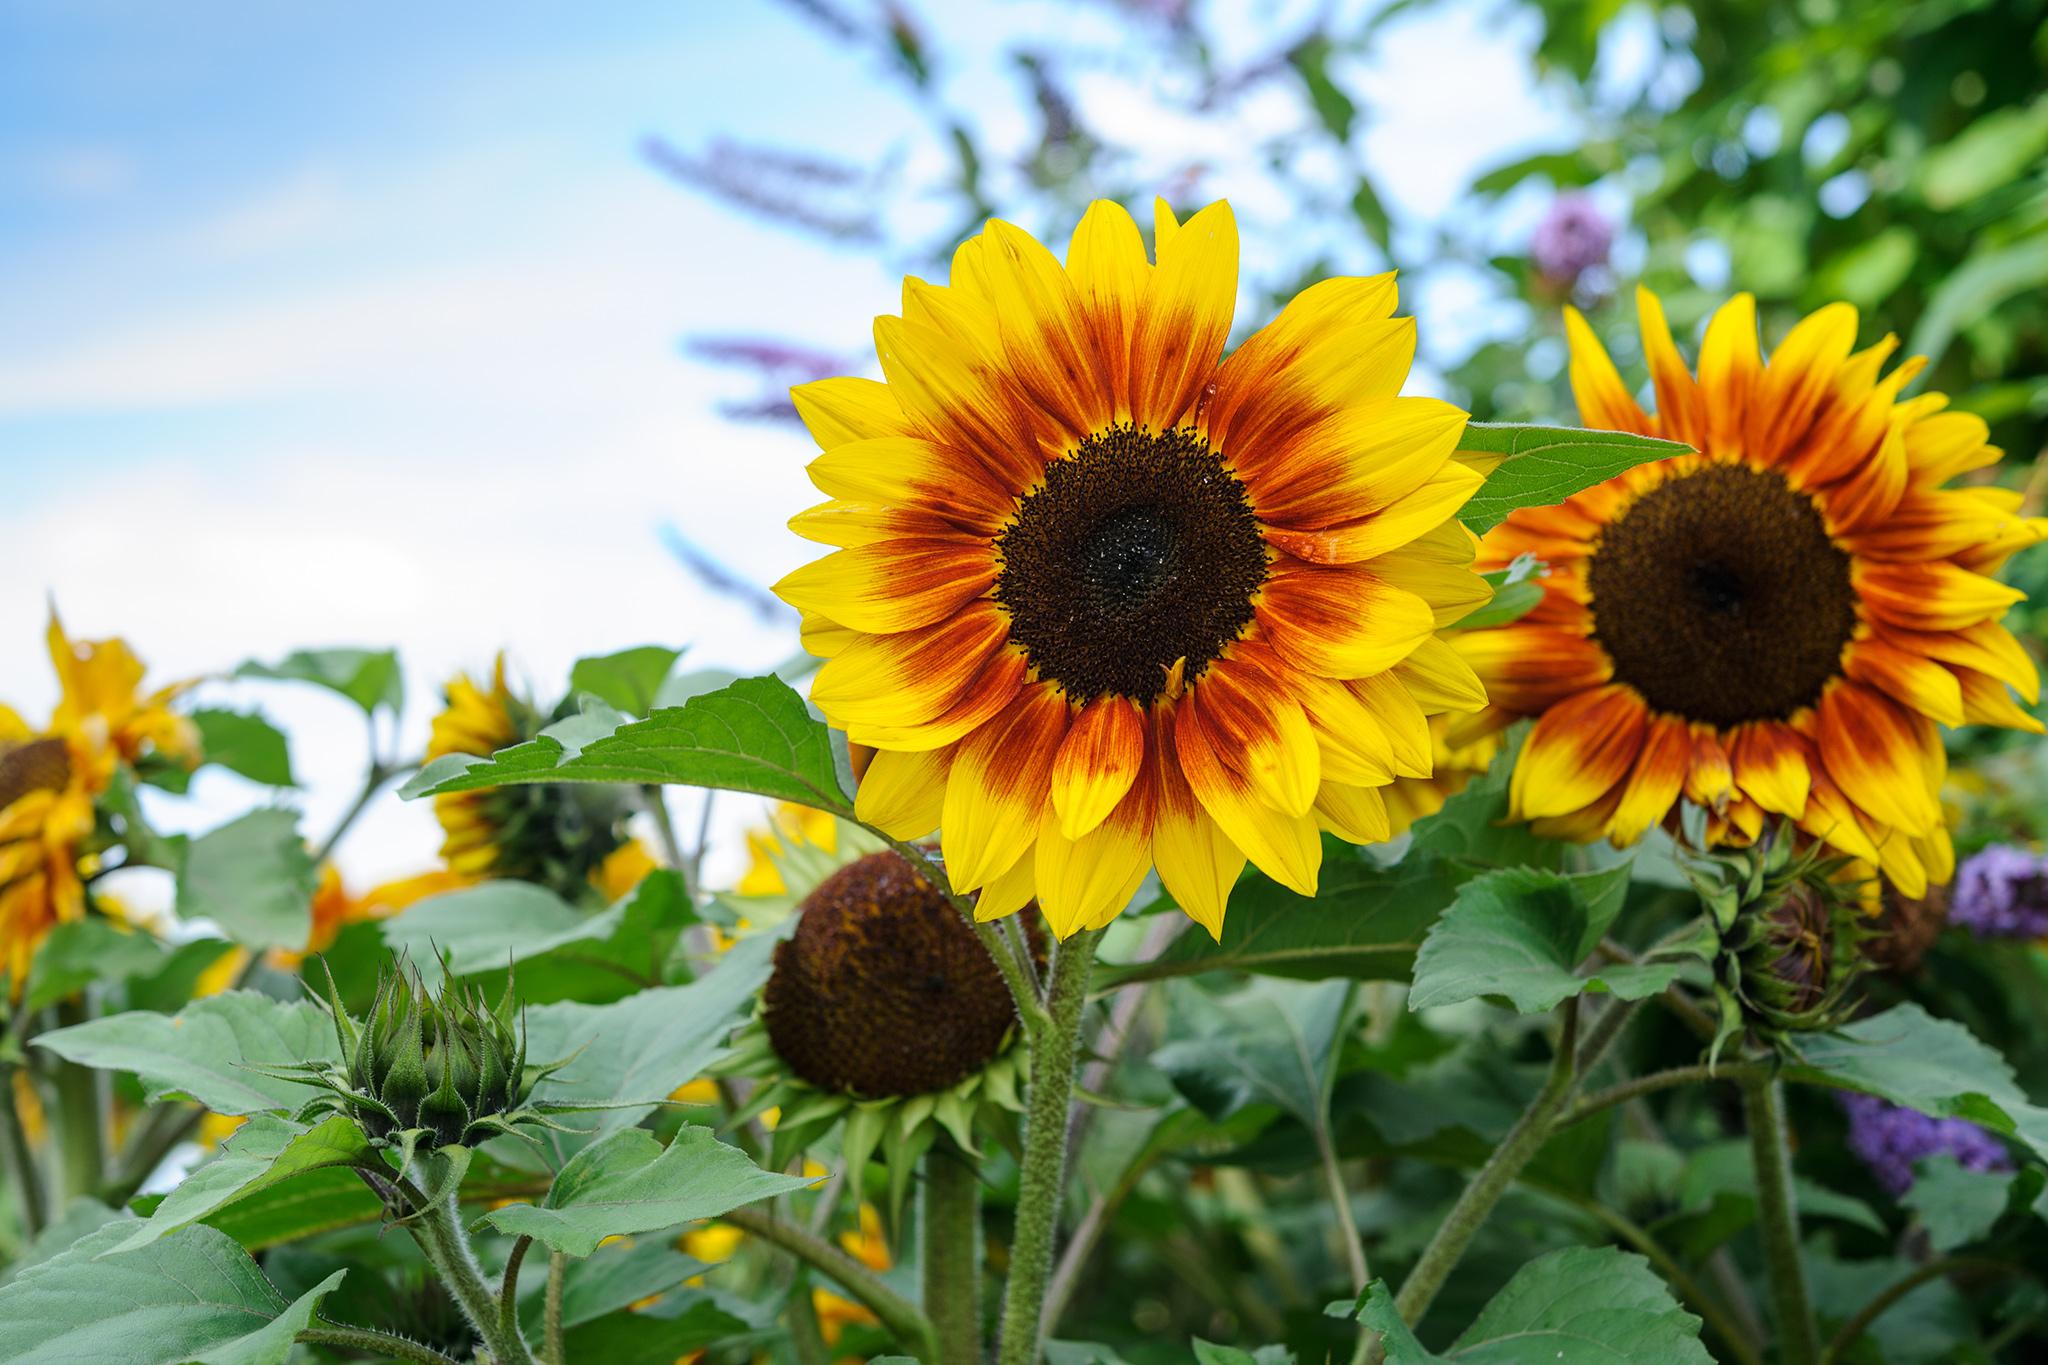 sunflower-helianthus-shock-o-lat-2